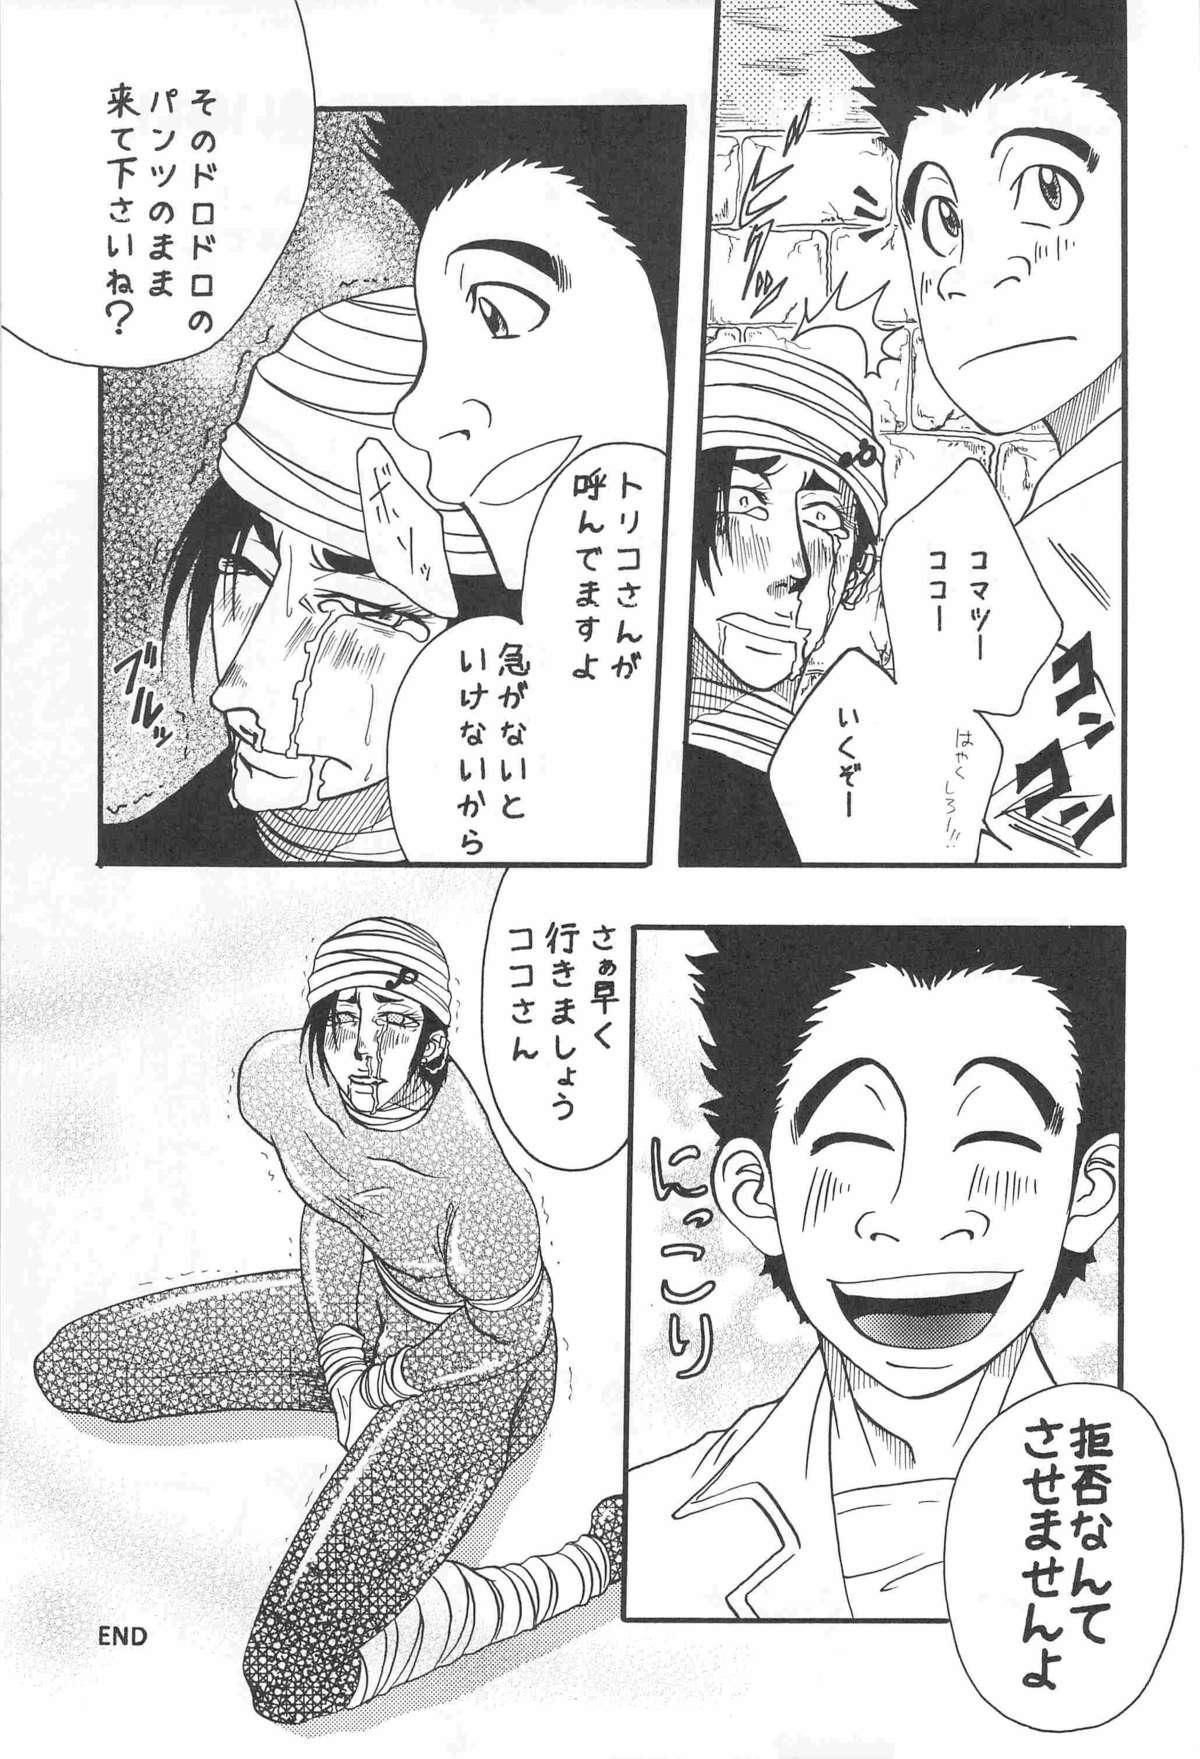 [Kijima Hyougo,Jun'ai Meringue-don,RIN!] [msbt] (Toriko) 22